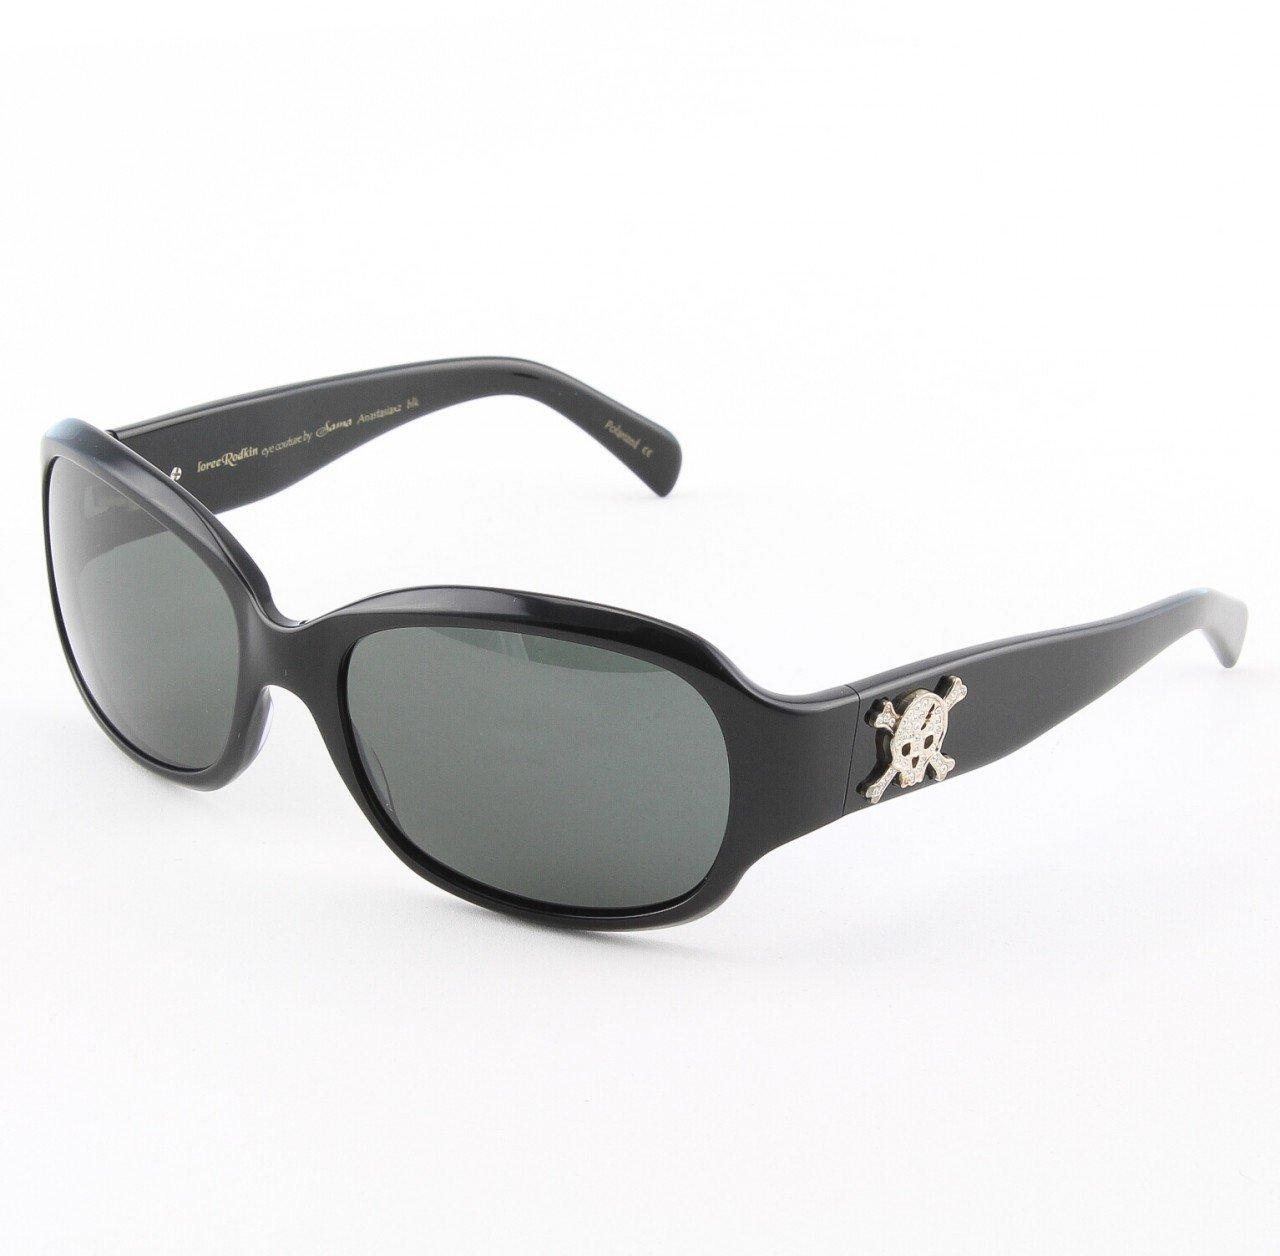 Loree Rodkin Anastasia Sunglasses by Sama Col. Black with Gray Lenses